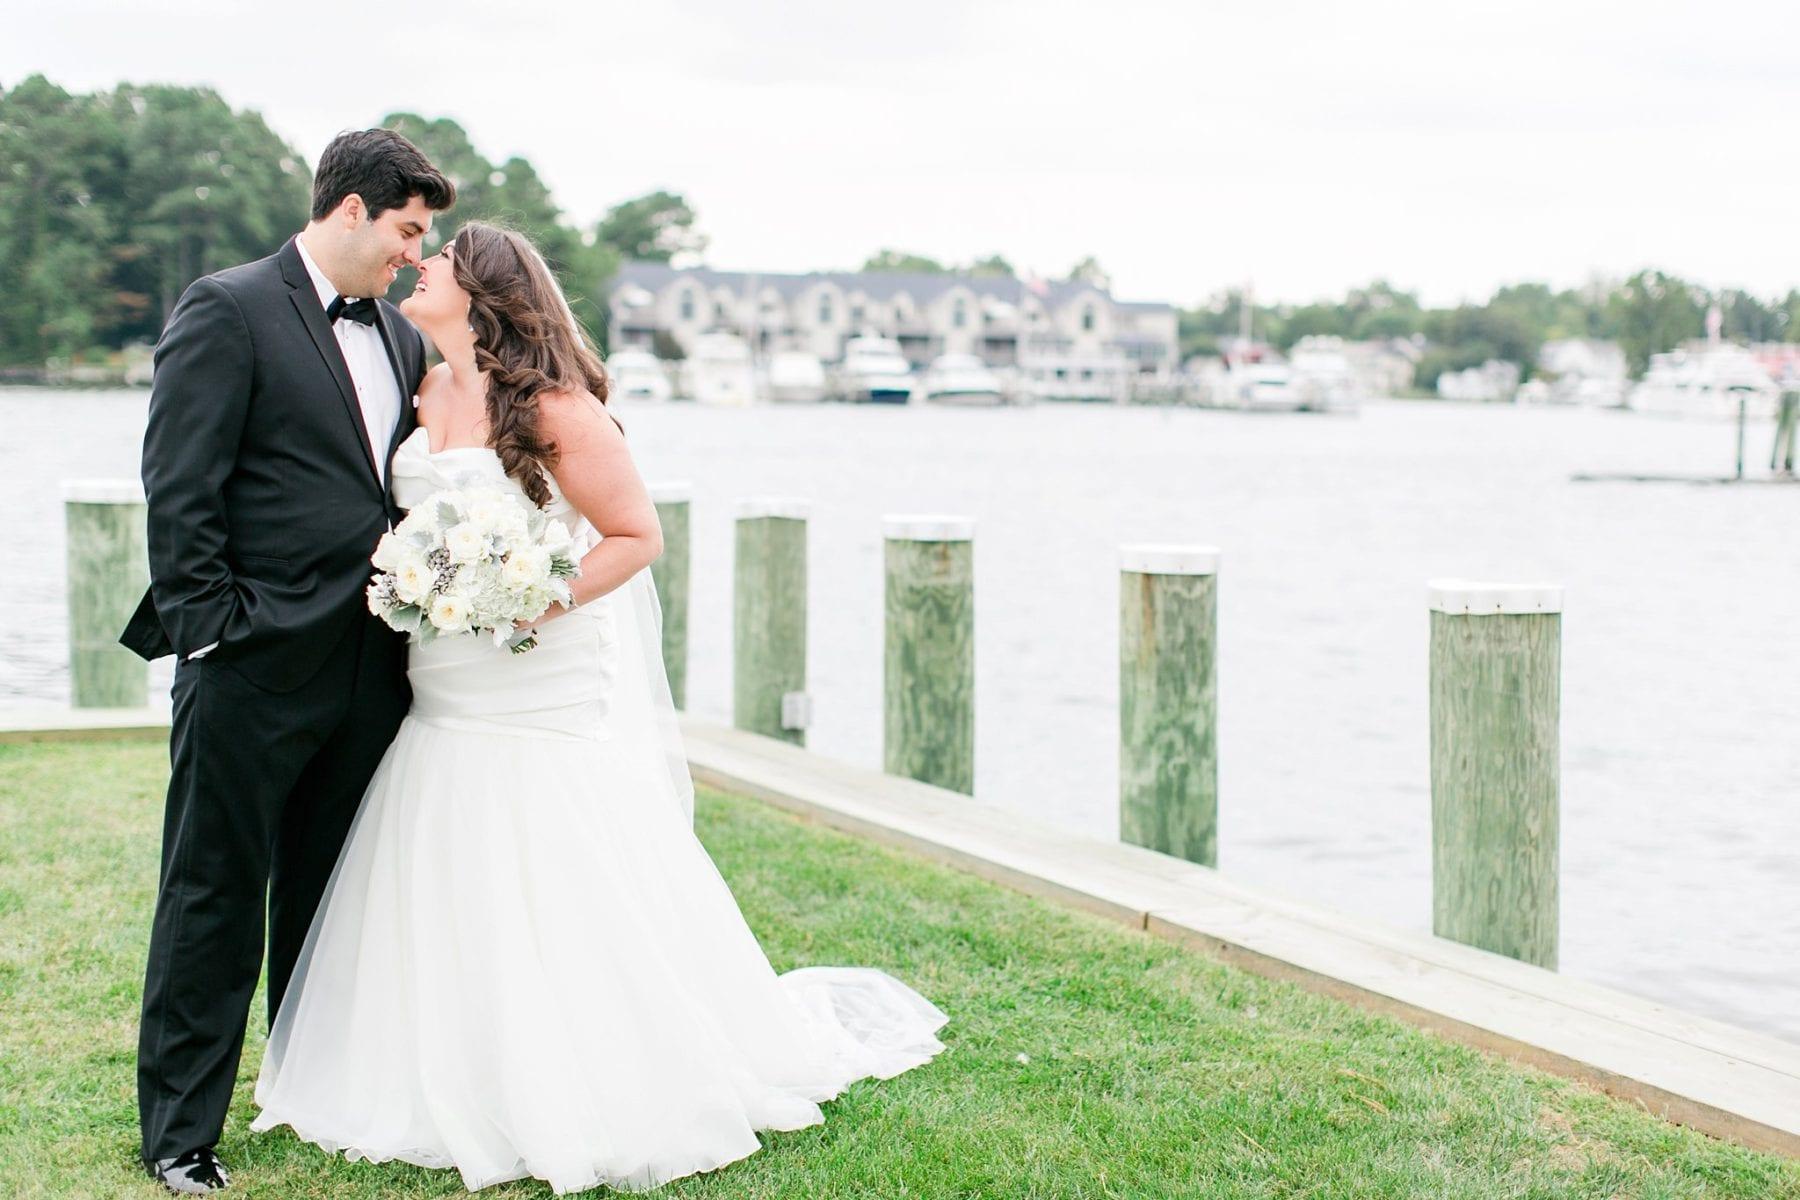 Chesapeake Bay Maritime Museum Wedding Photos Maryland Wedding Photographer Megan Kelsey Photography Halie & Mike-55.jpg